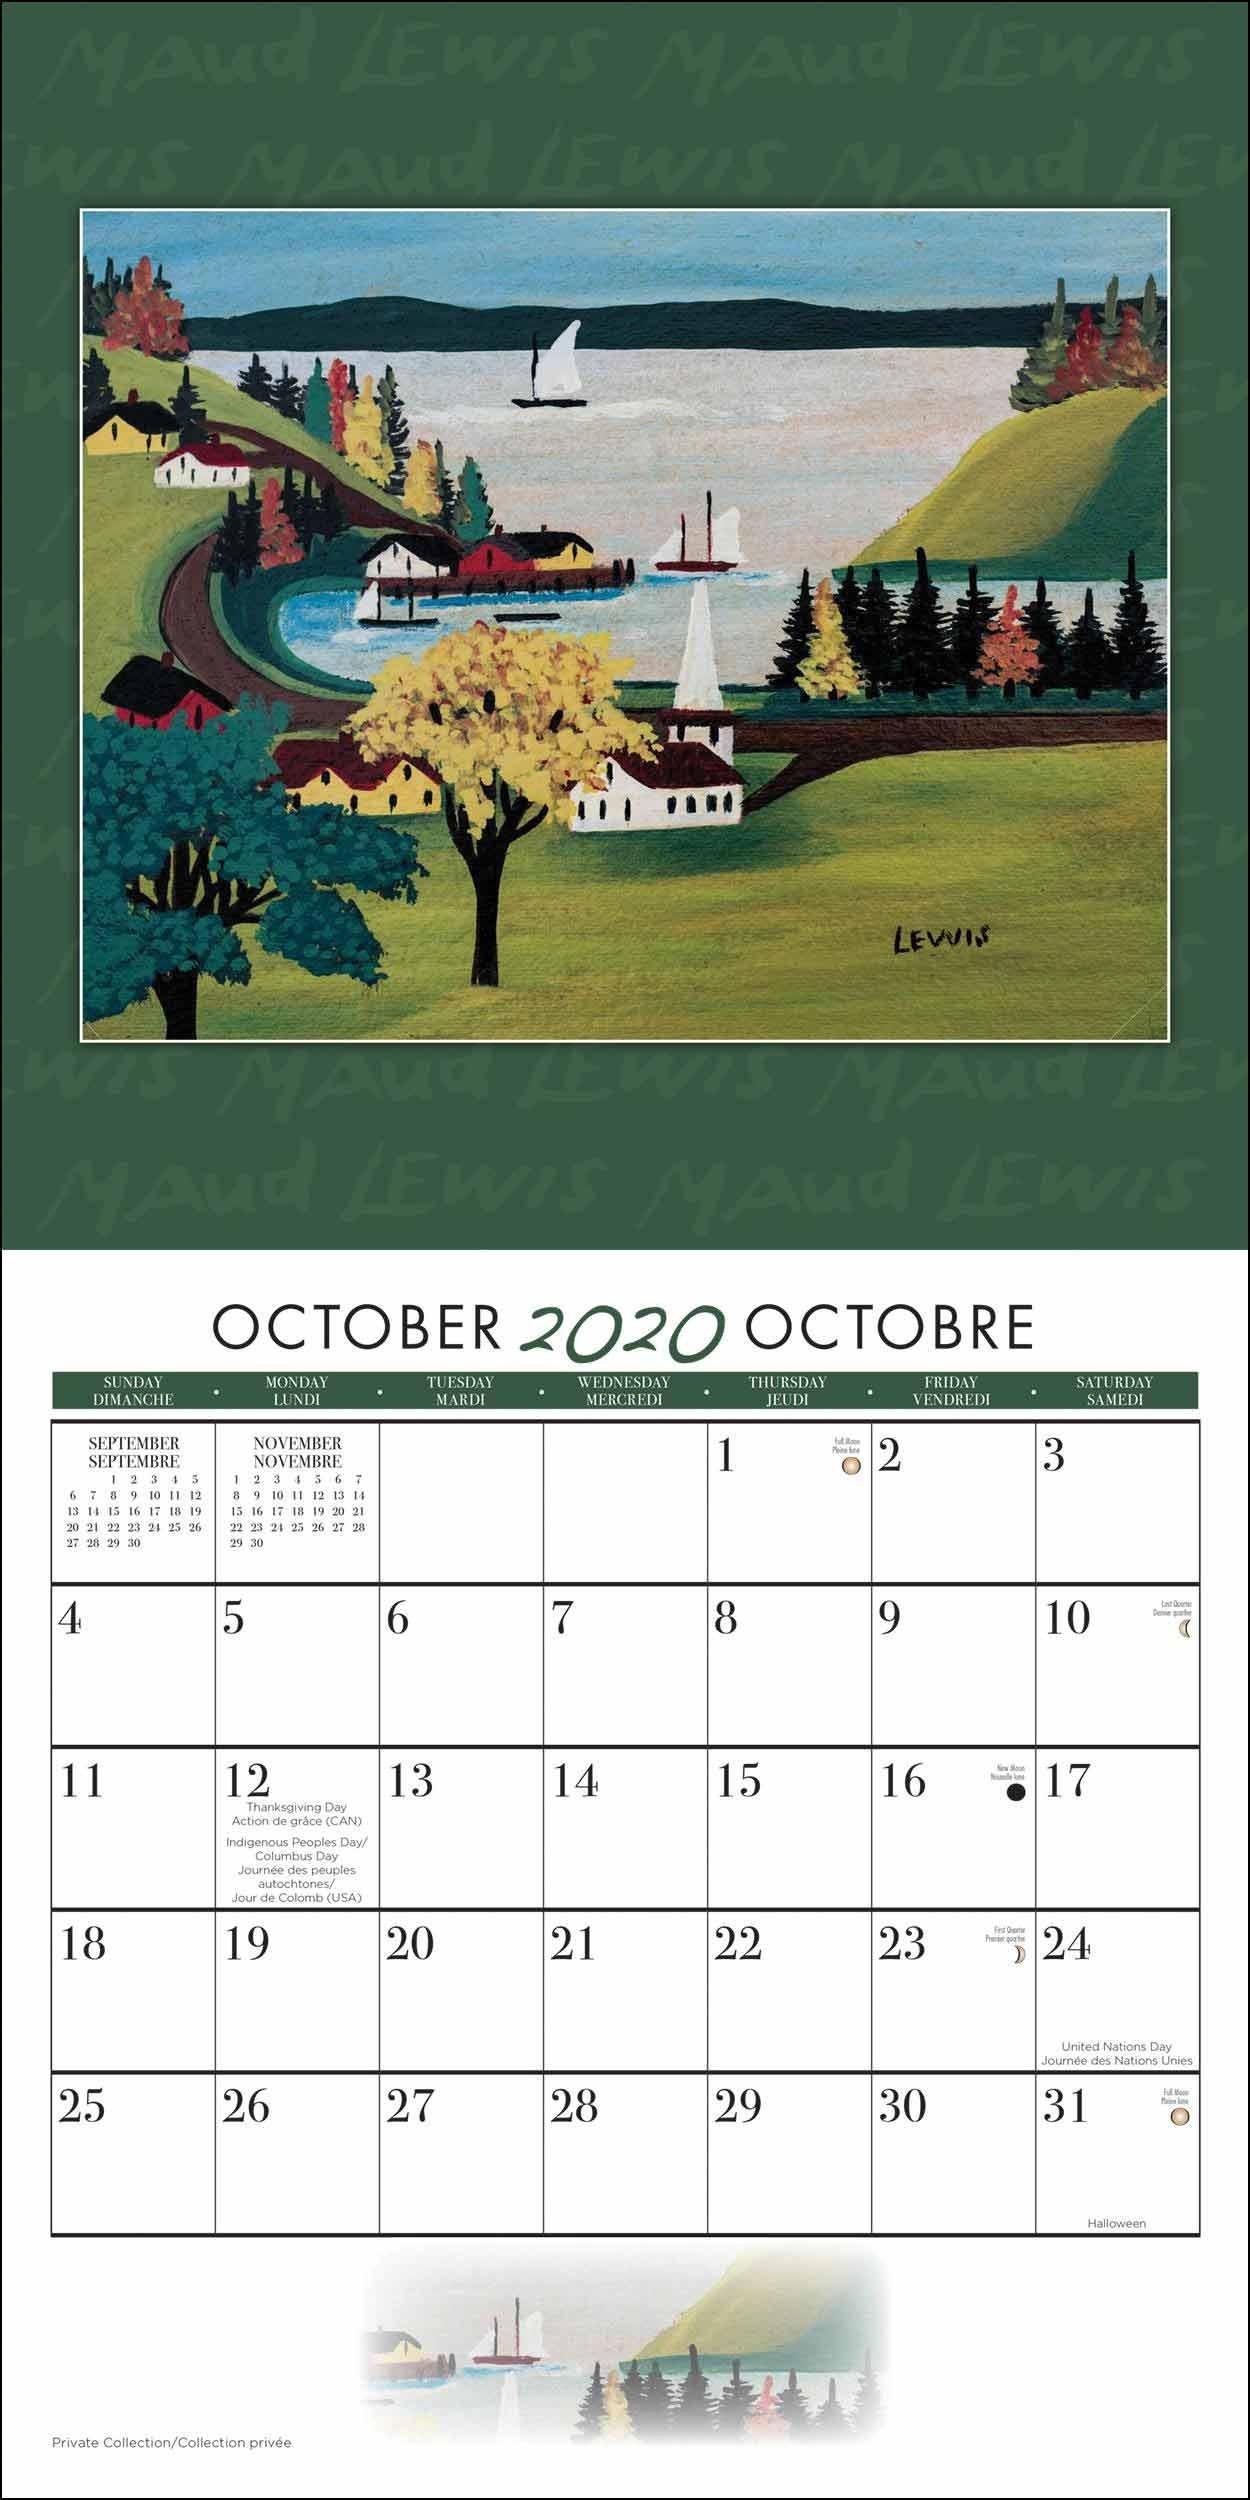 John Lewis Advent Calendar 2020 – Template Calendar Design